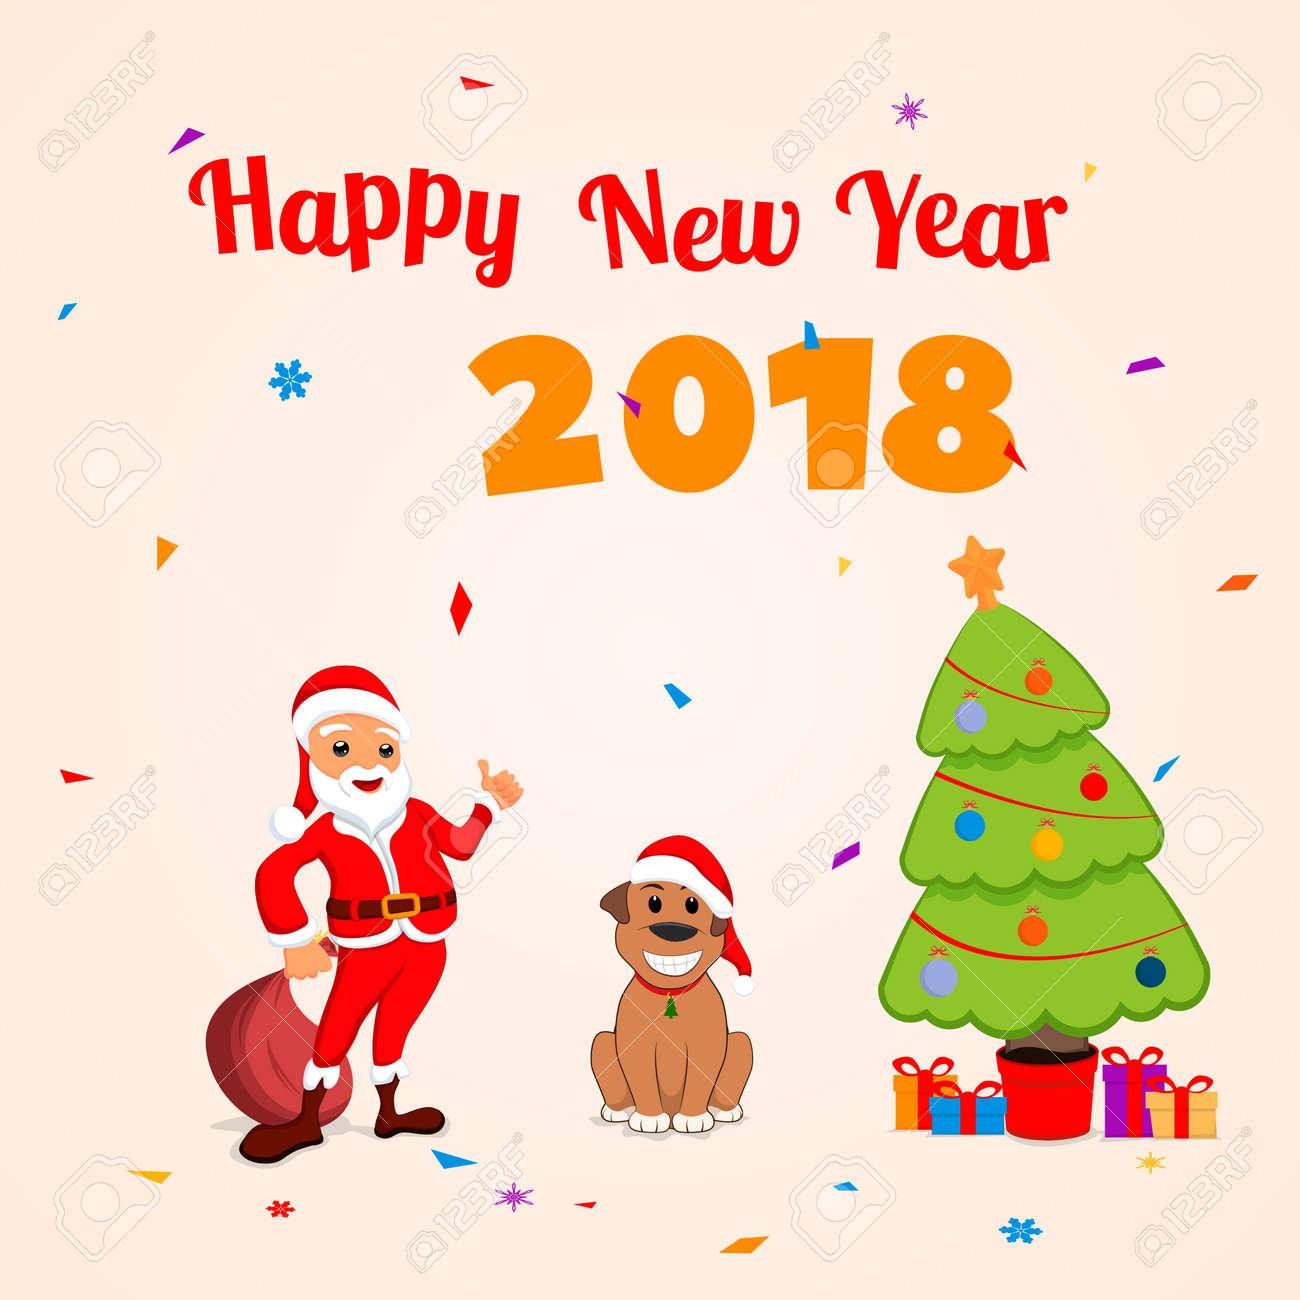 Santa claus and funny dog new year illustration royalty free santa claus and funny dog new year illustration stock vector 89275322 kristyandbryce Choice Image